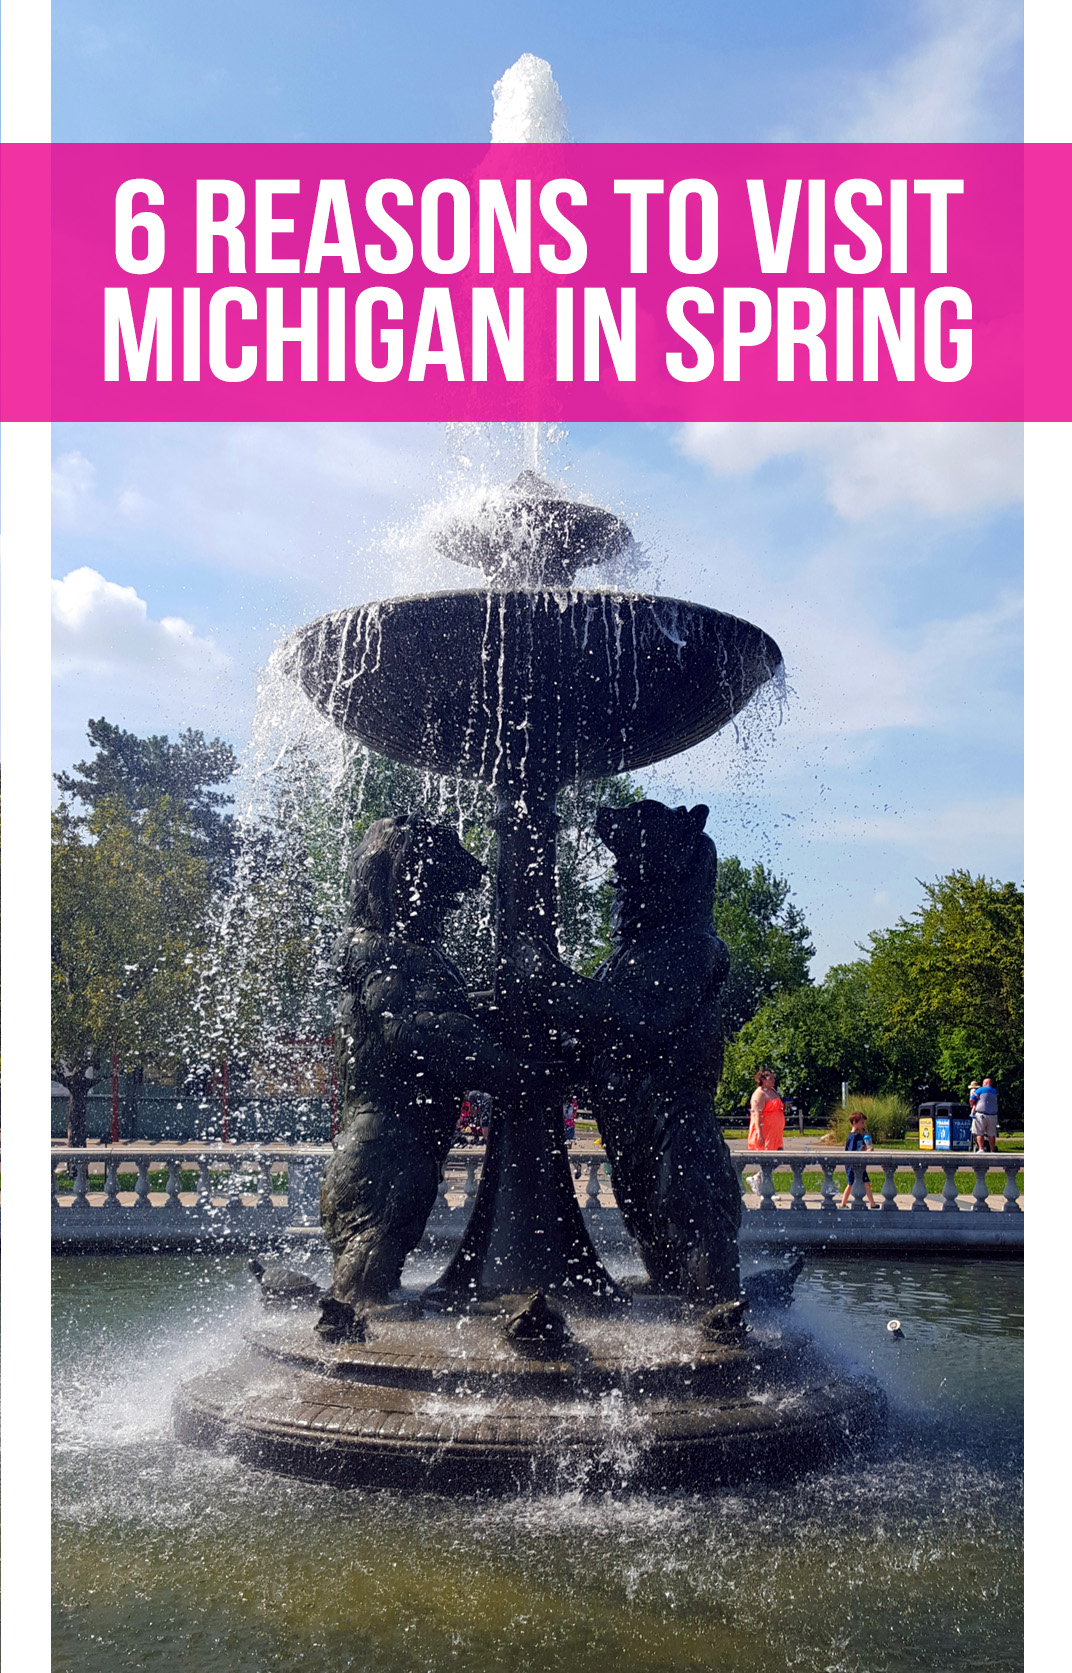 Six reasons to visit Michigan in Spring